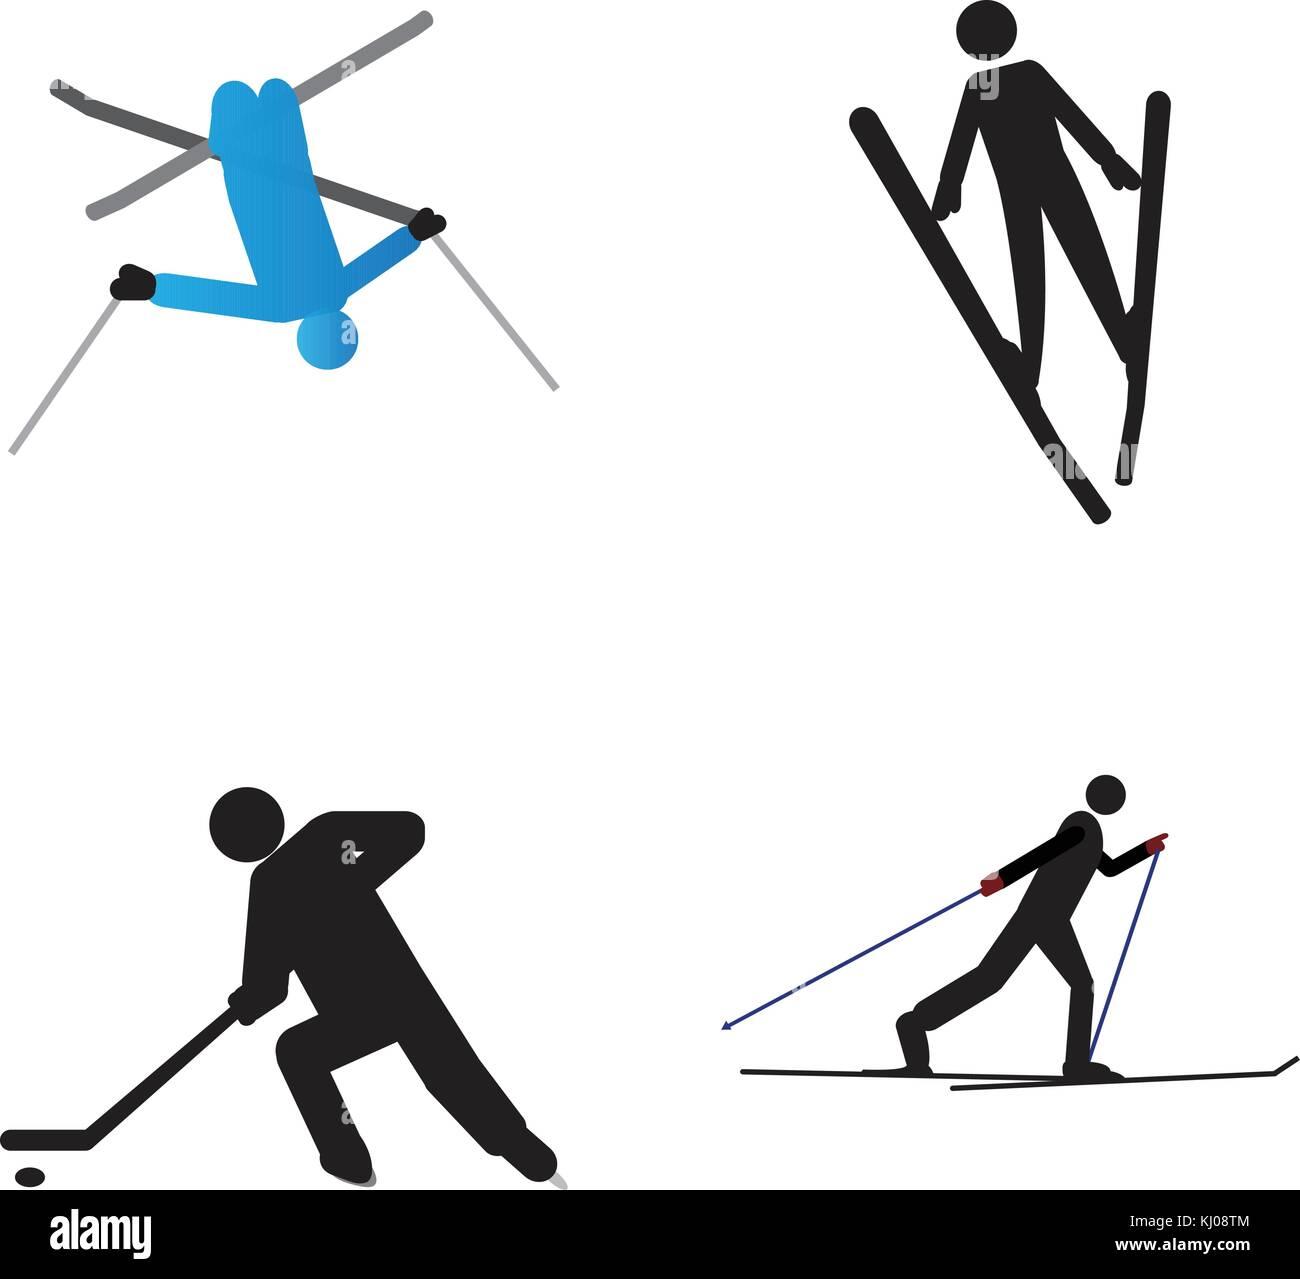 Set of winter sport symbols stock vector art illustration set of winter sport symbols biocorpaavc